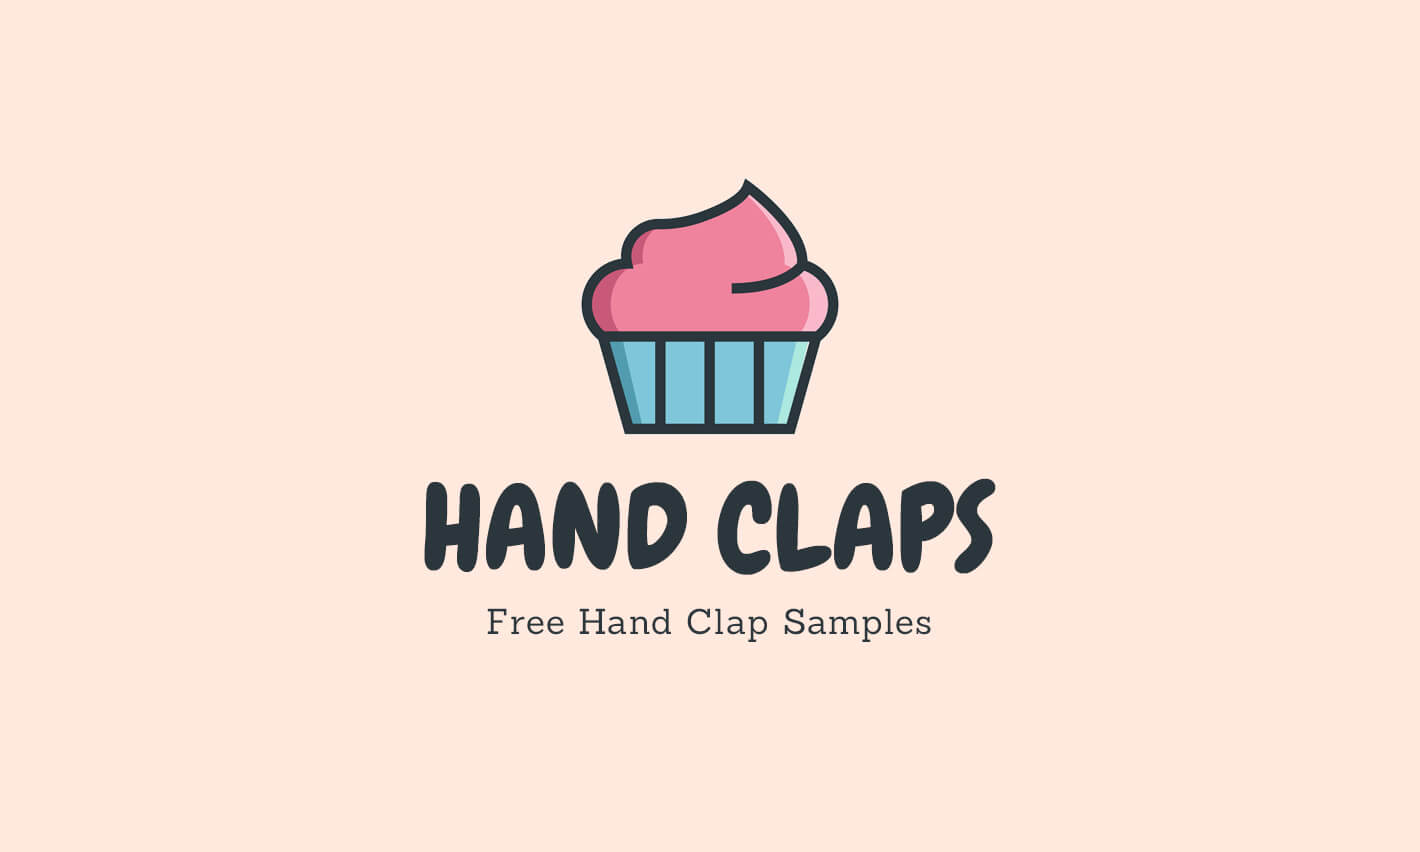 Free Hand Clap Samples - WAVBVKERY